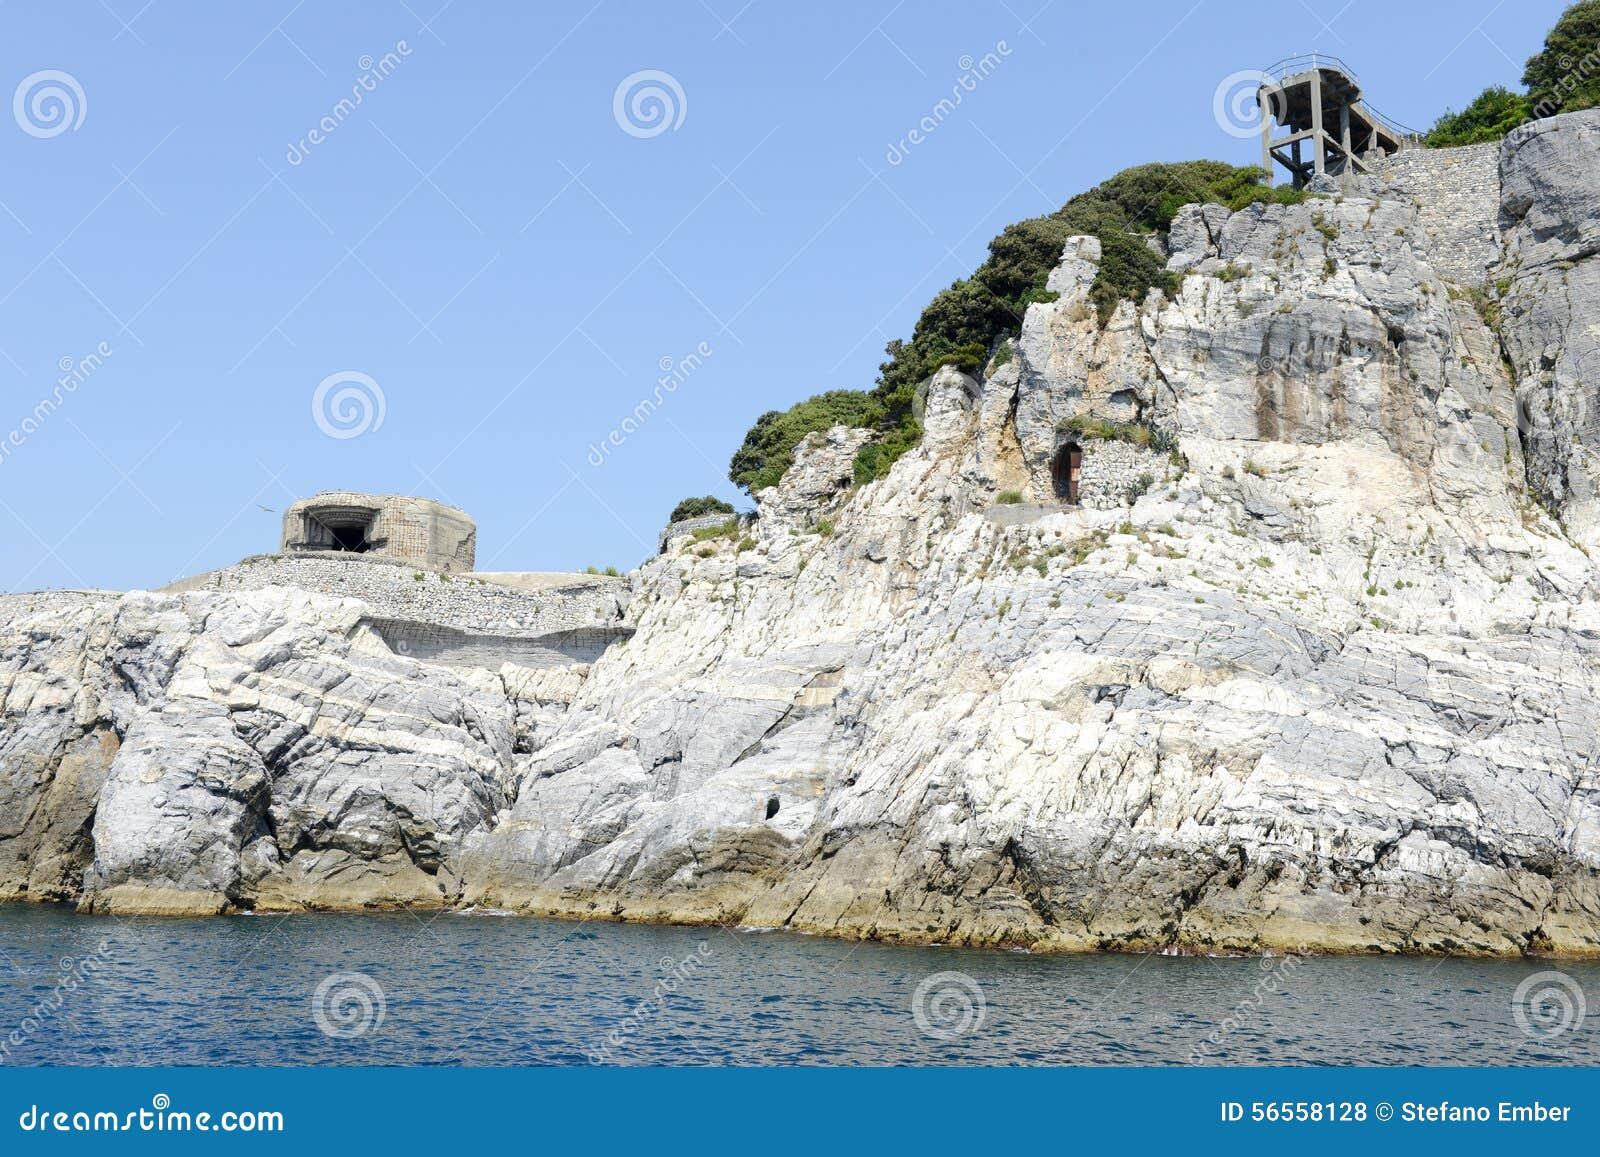 Download Νησί του Tino κοντά σε Portovenere Στοκ Εικόνες - εικόνα από αυτοκρατορία, καλοκαίρι: 56558128